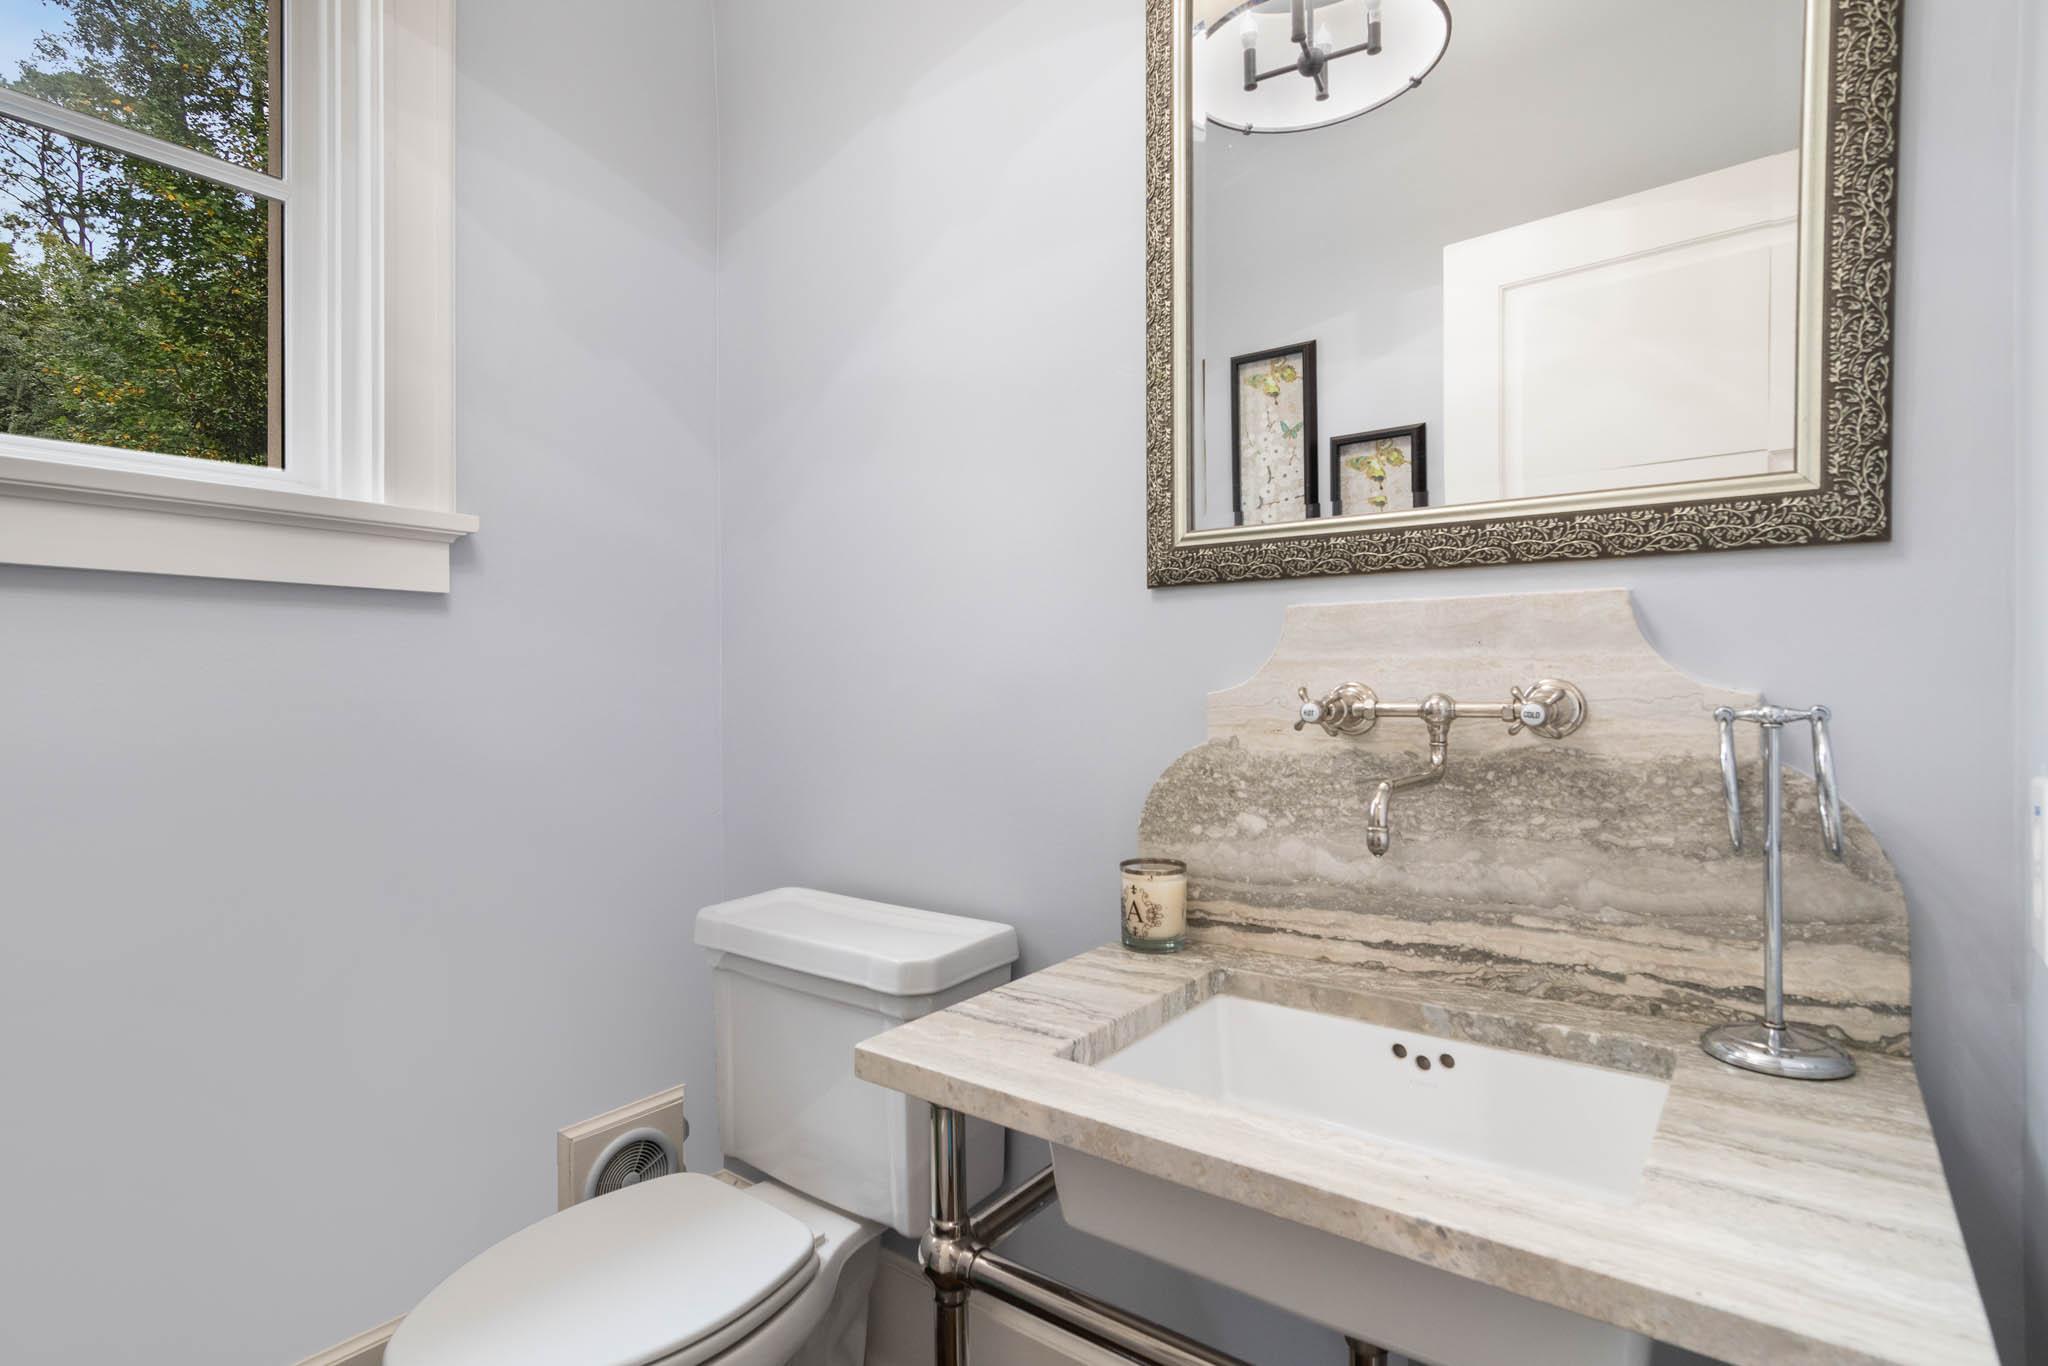 real_estate_photographer_bathroom_photography-14.jpg